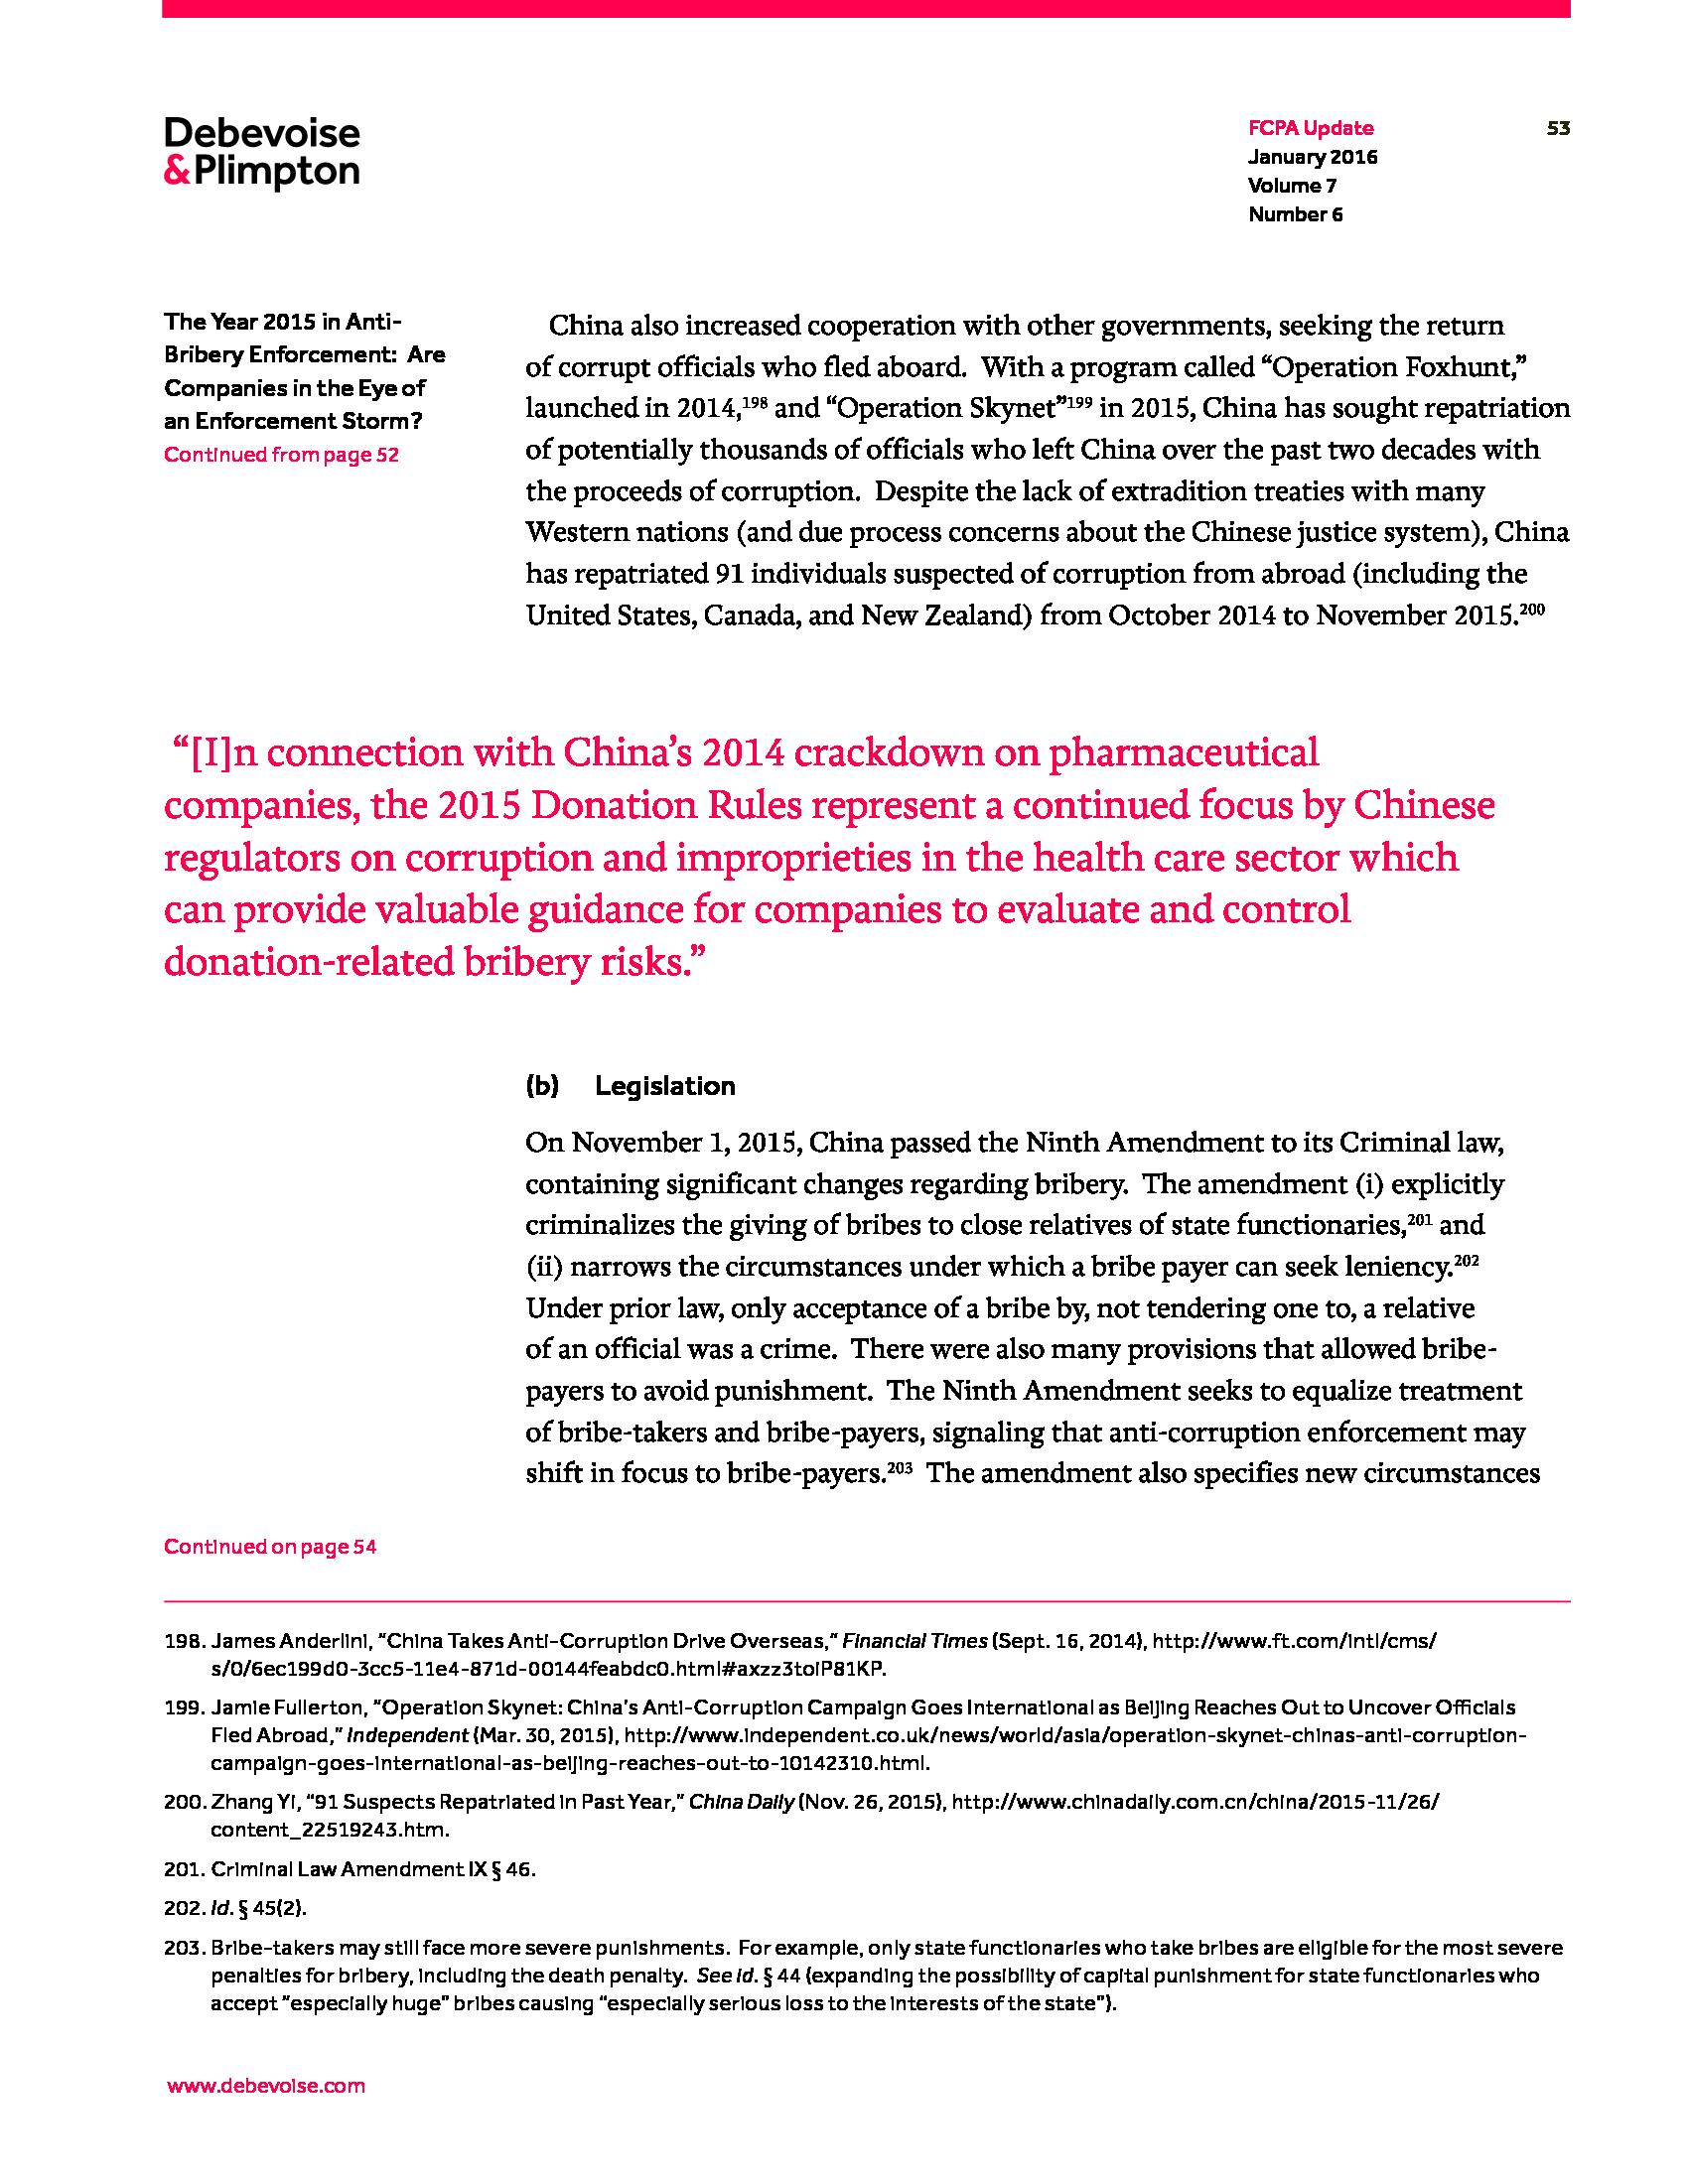 Advisorselect - FCPA Update January 2016